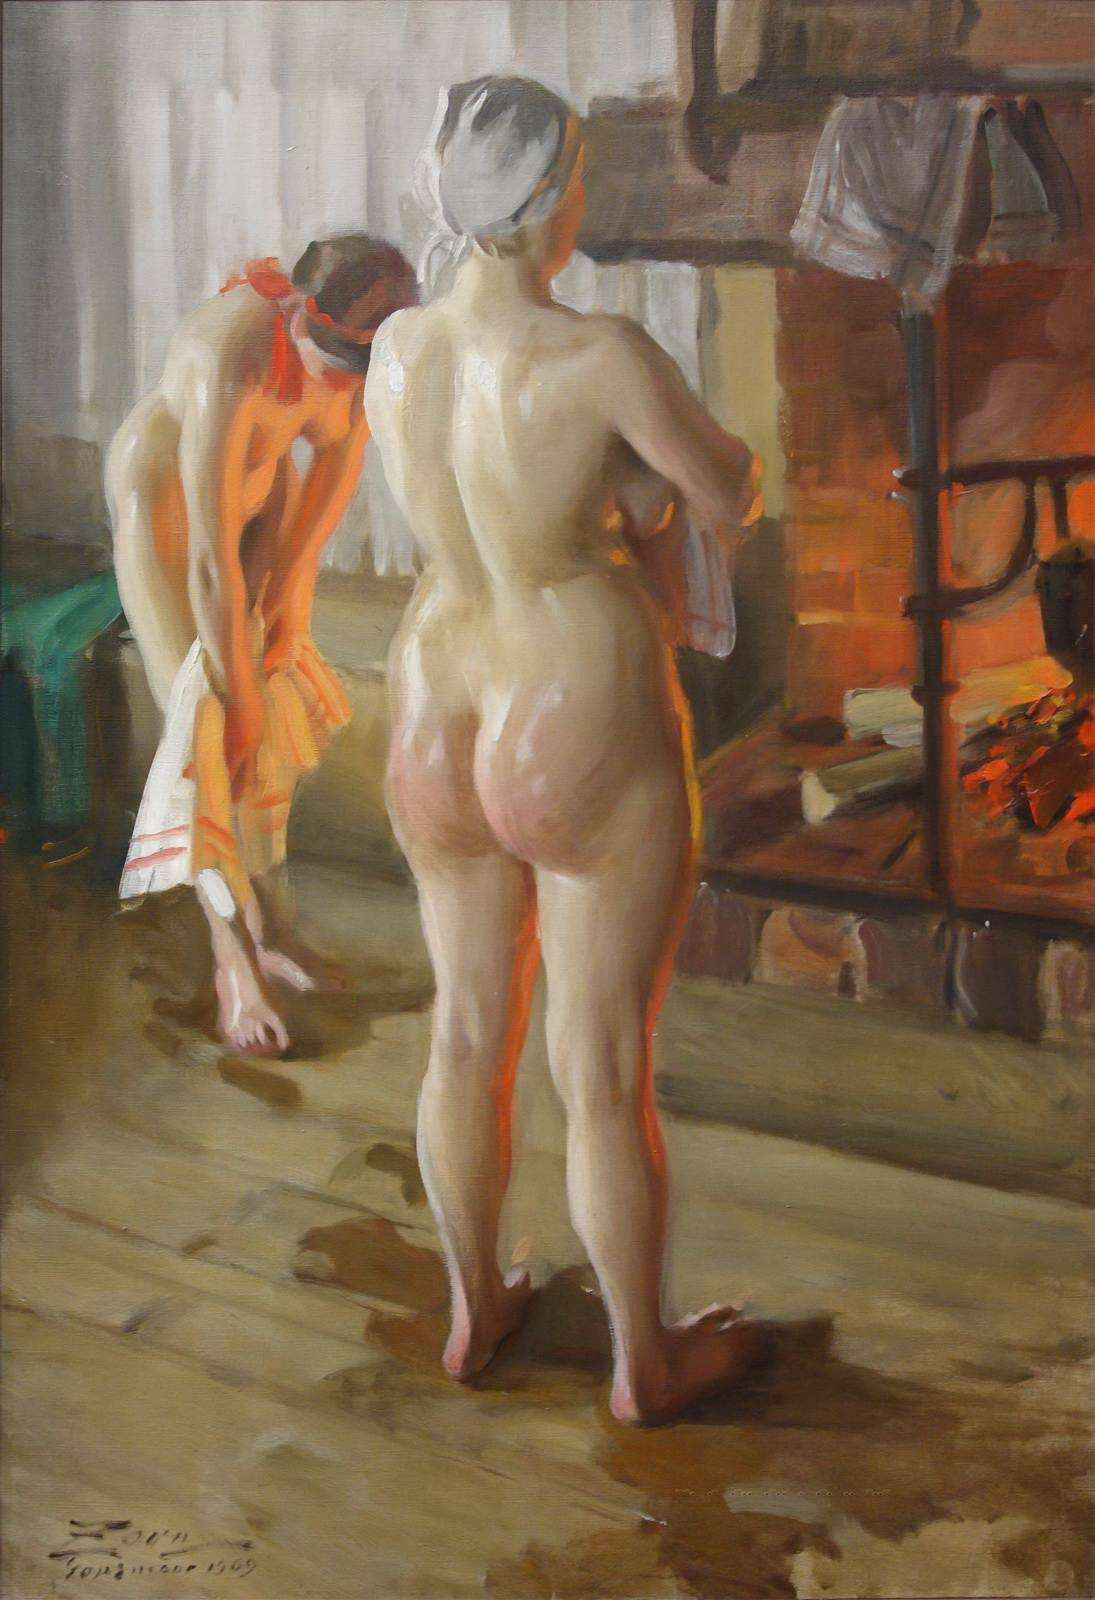 Anders Leonard Zorn. 1860-1920. Мать и дочь. 1909, 90 х 62 см. Мура, Музей Цорна